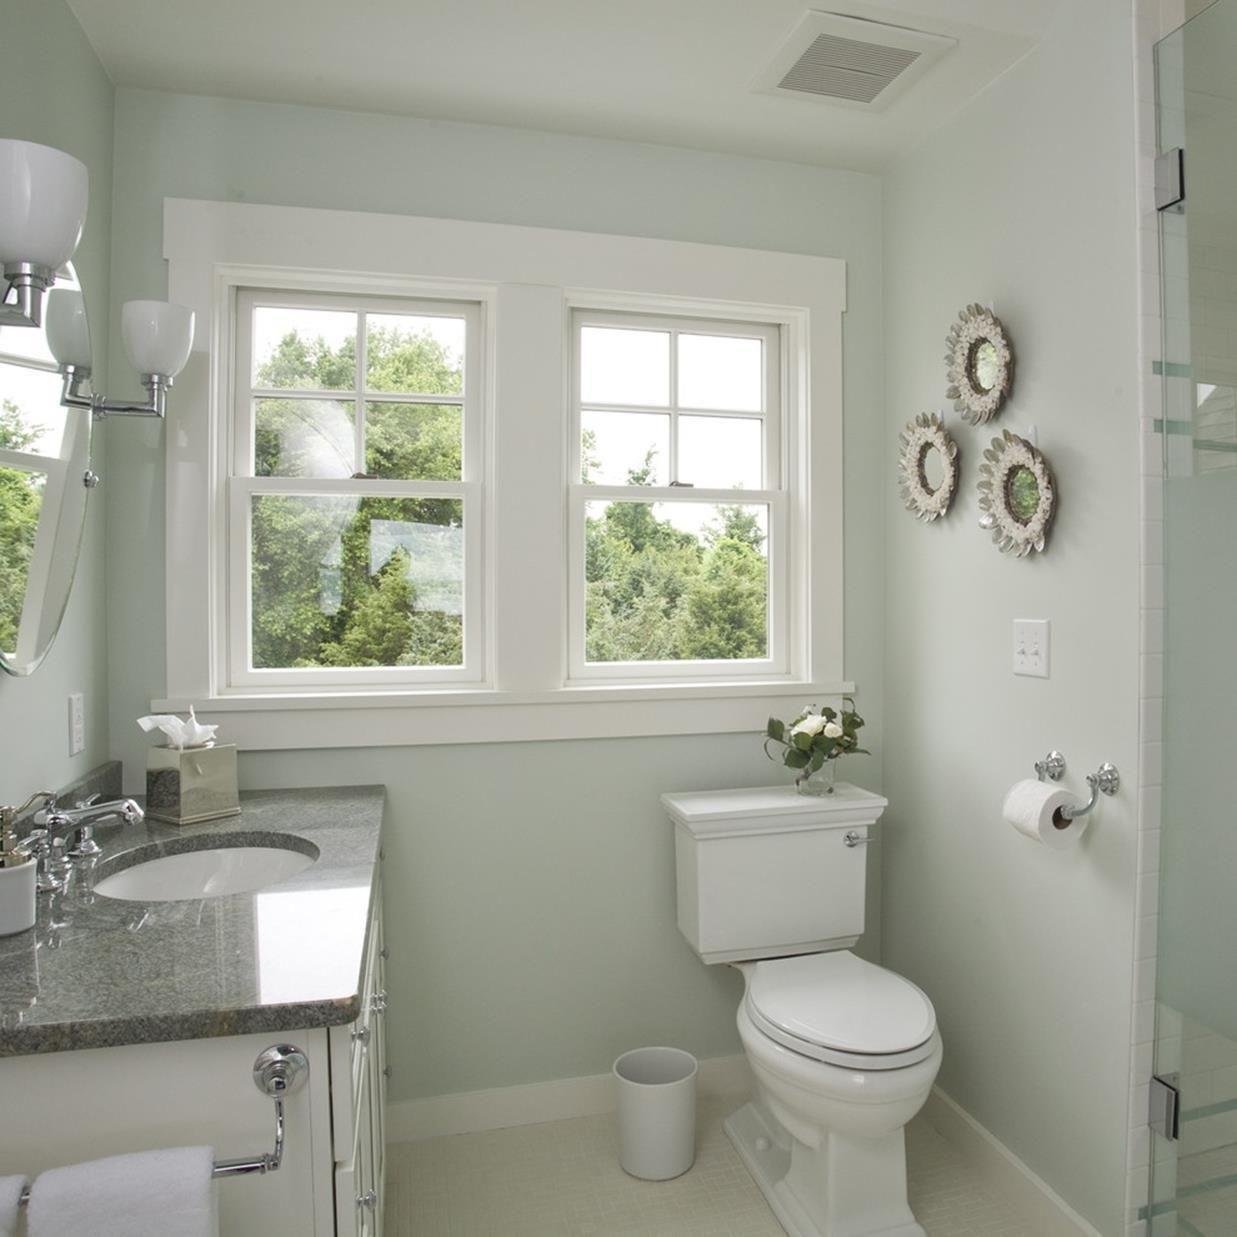 Best Paint Colors For Small Bathrooms 32 Decorecord Small Bathroom Paint Small Bathroom Colors Bathroom Color Schemes